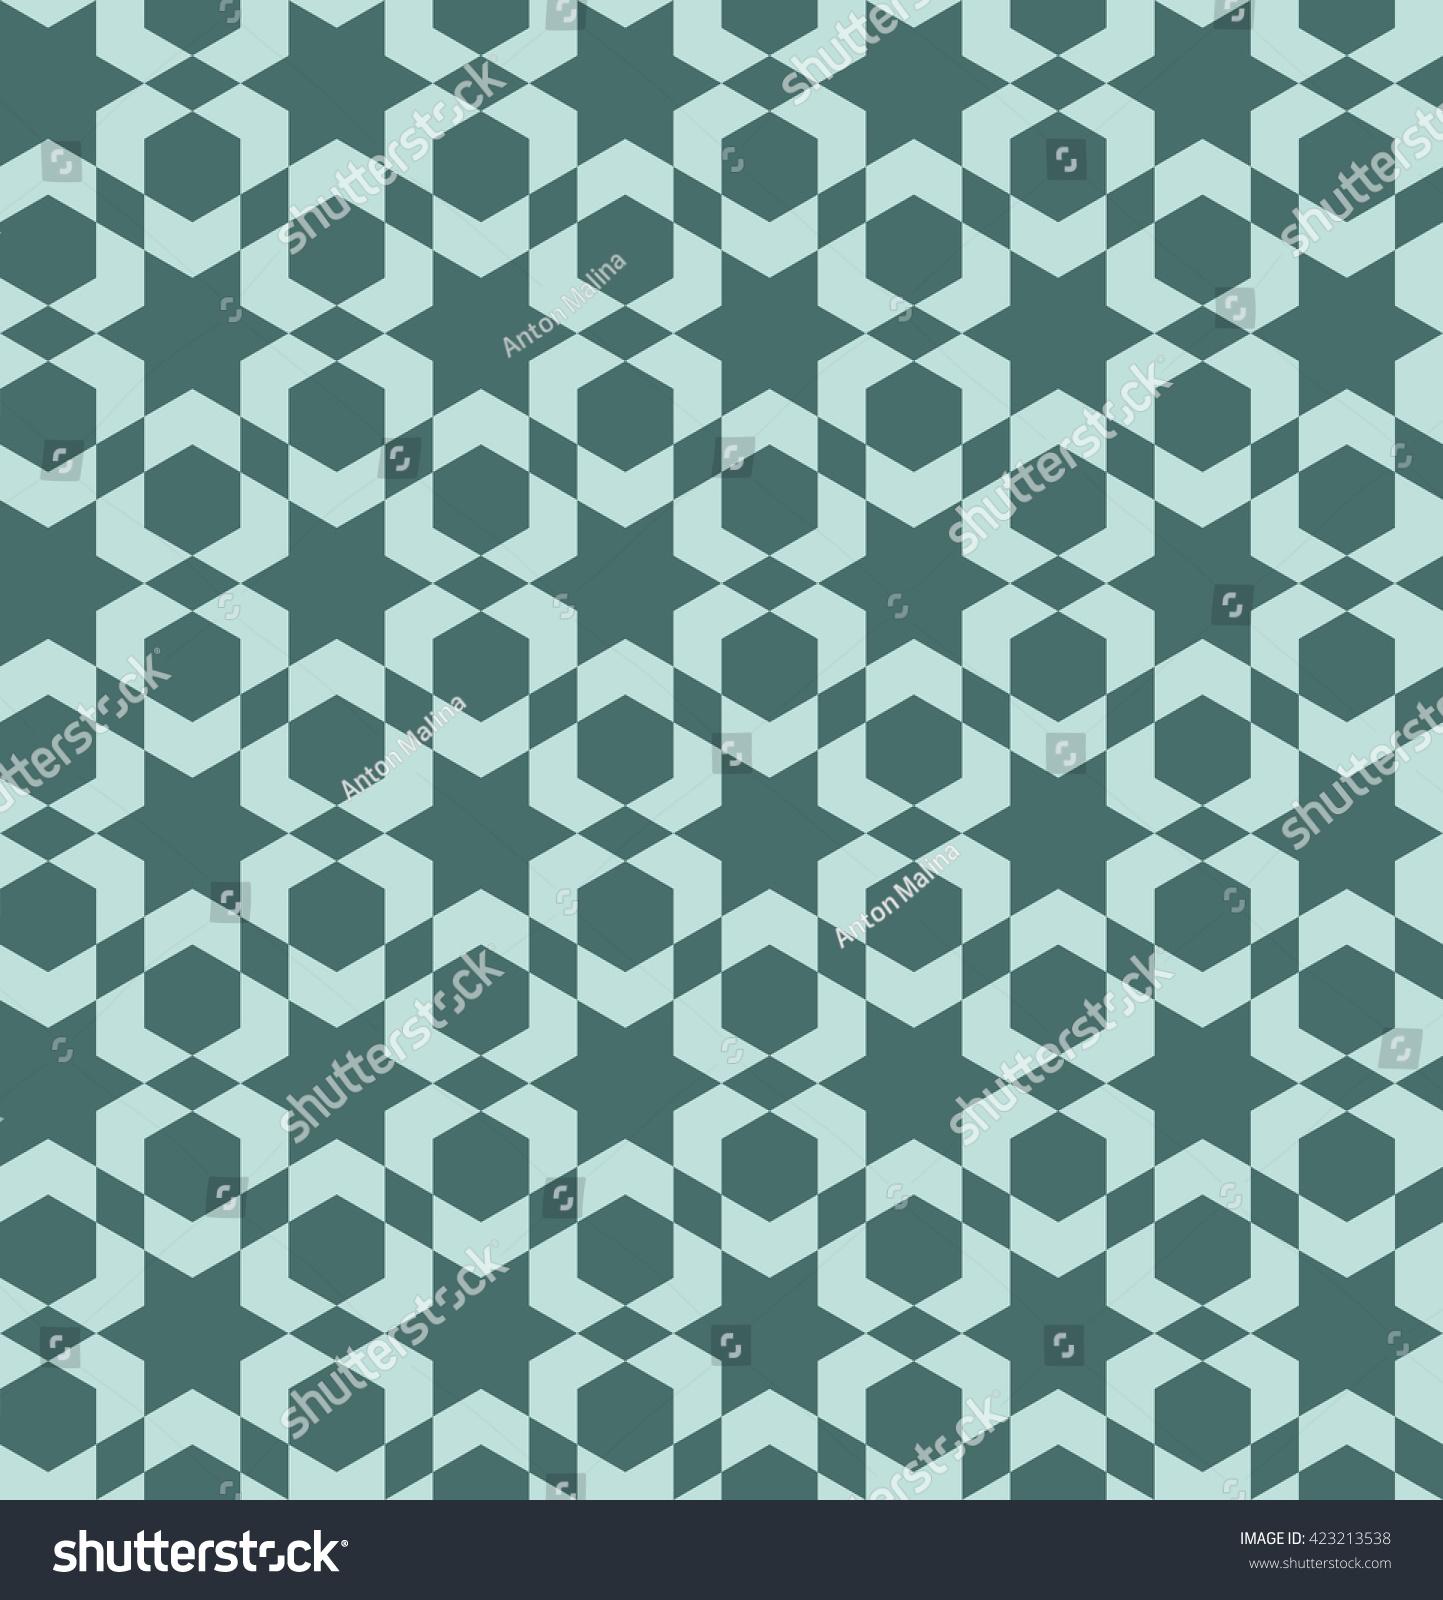 Moroccan geometric pattern royalty free stock photos image 13547078 - Moroccan Tile Geometric